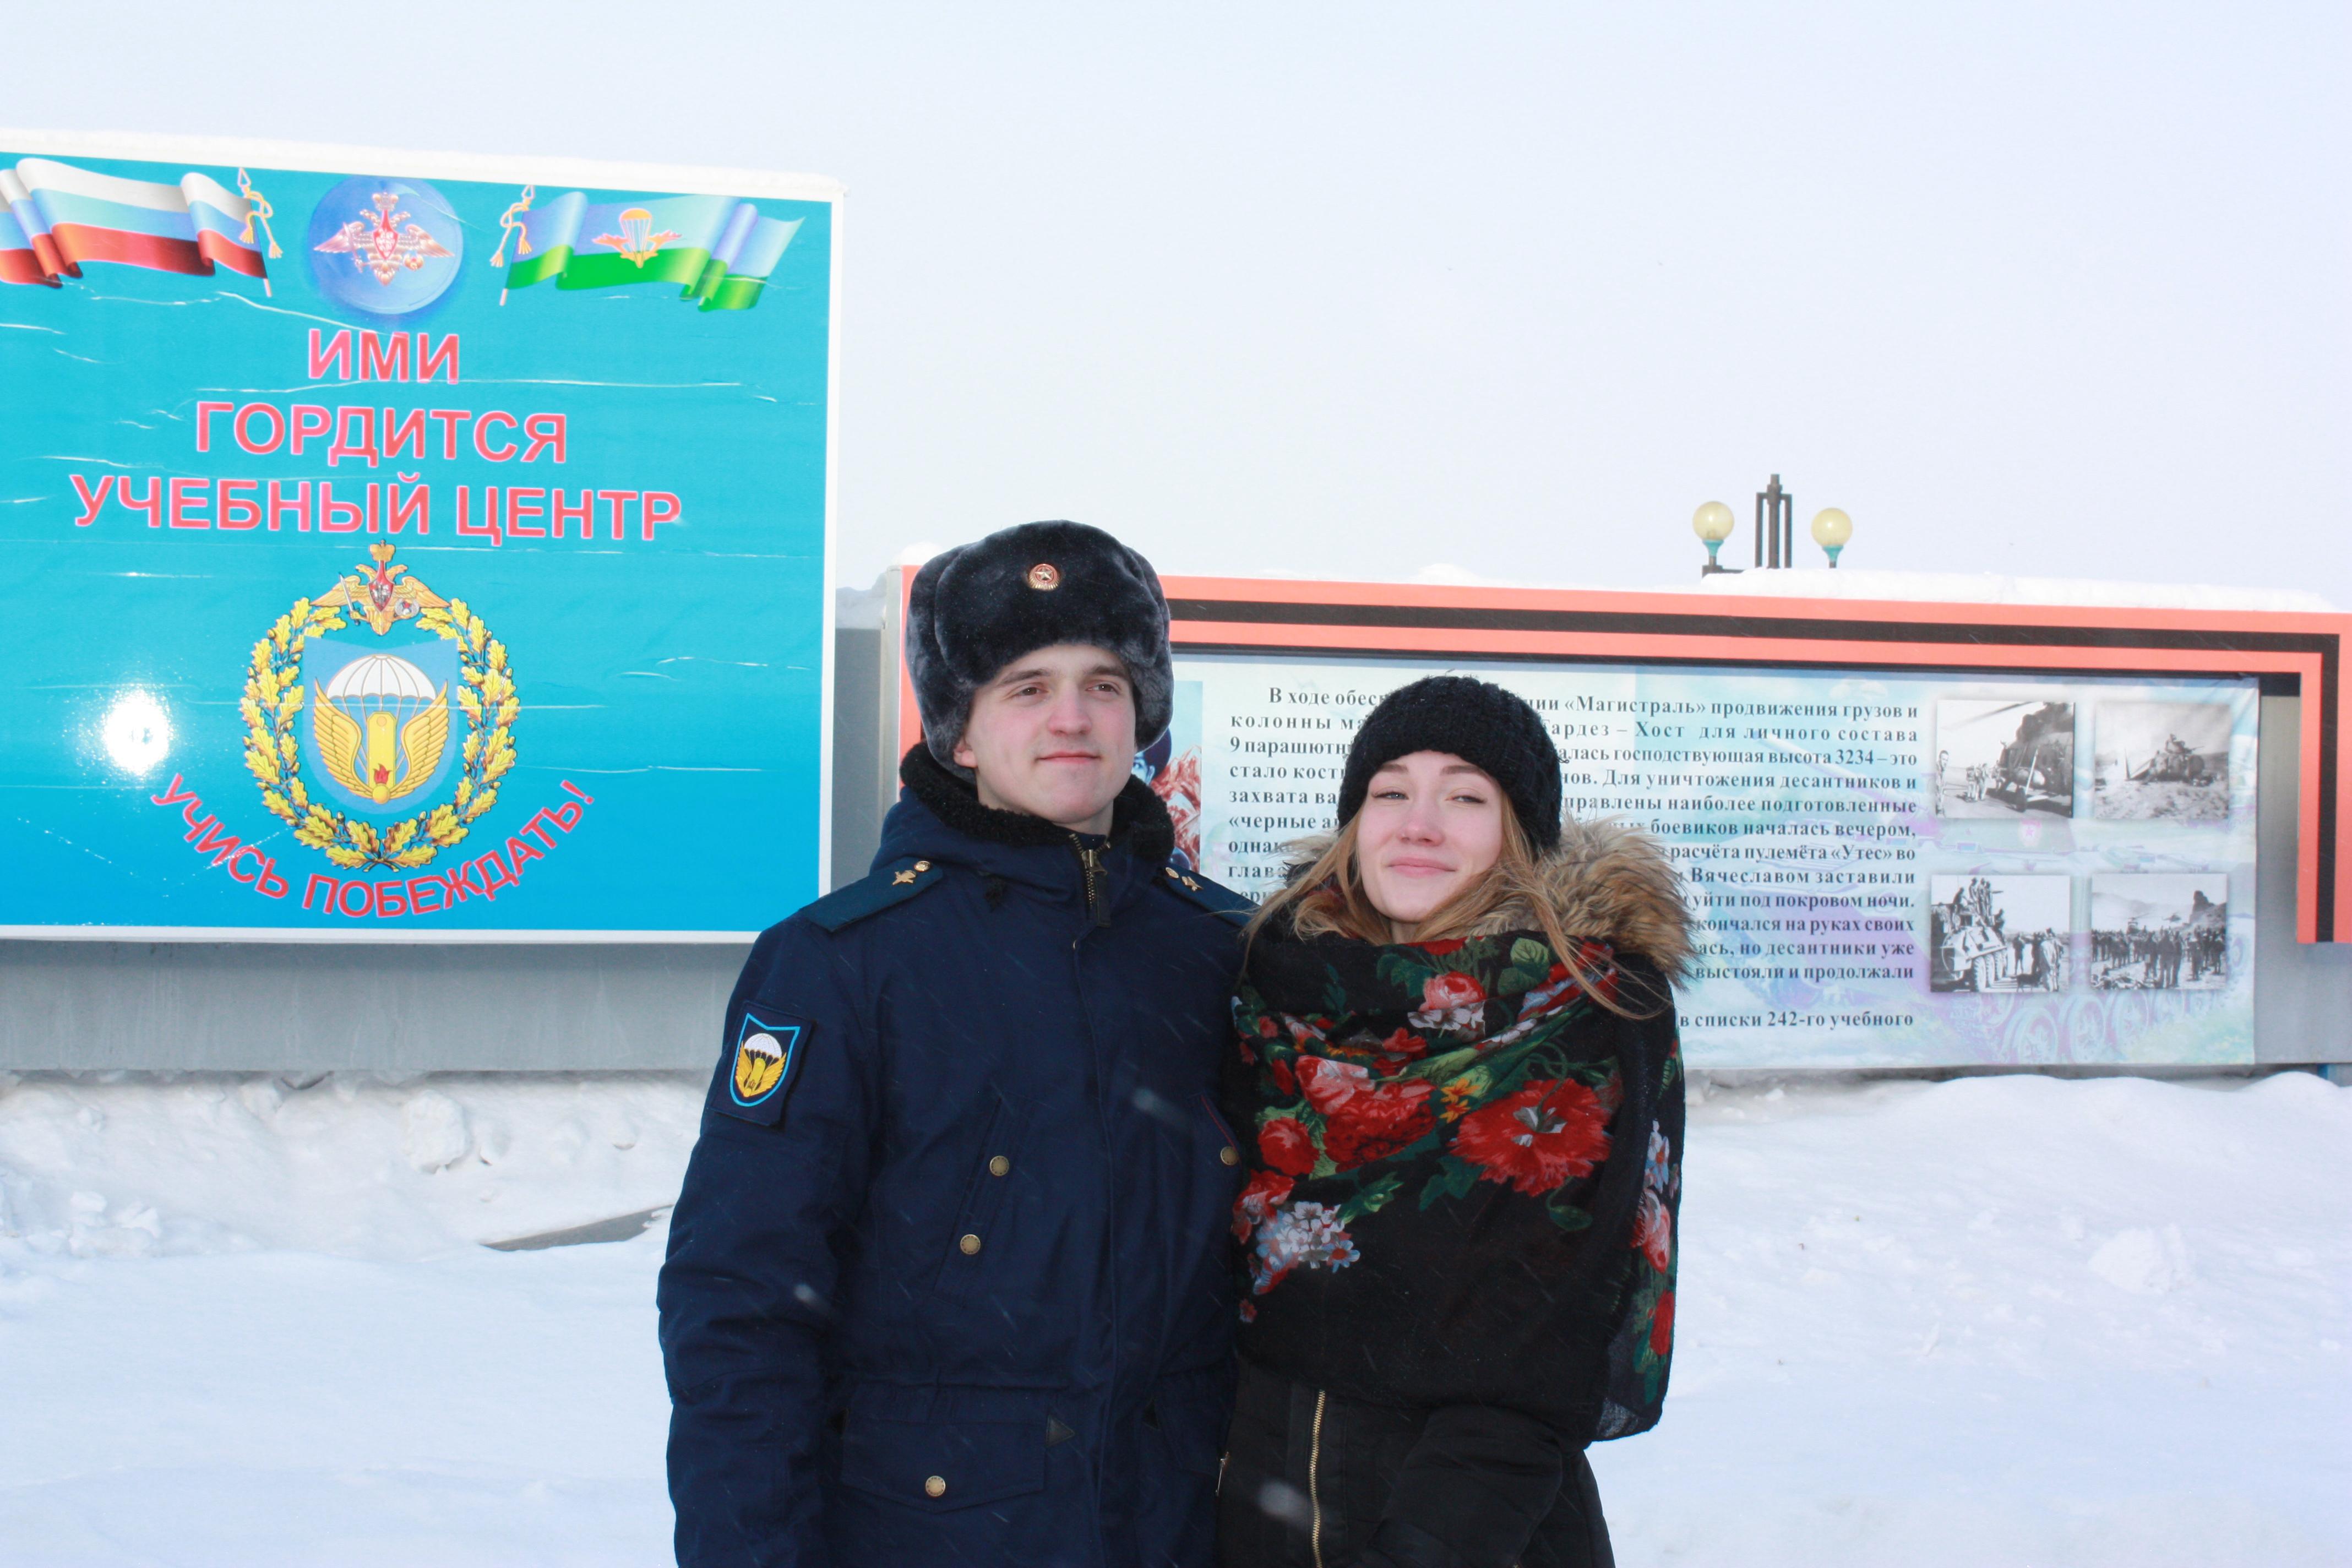 http://s6.uploads.ru/x6oIW.jpg